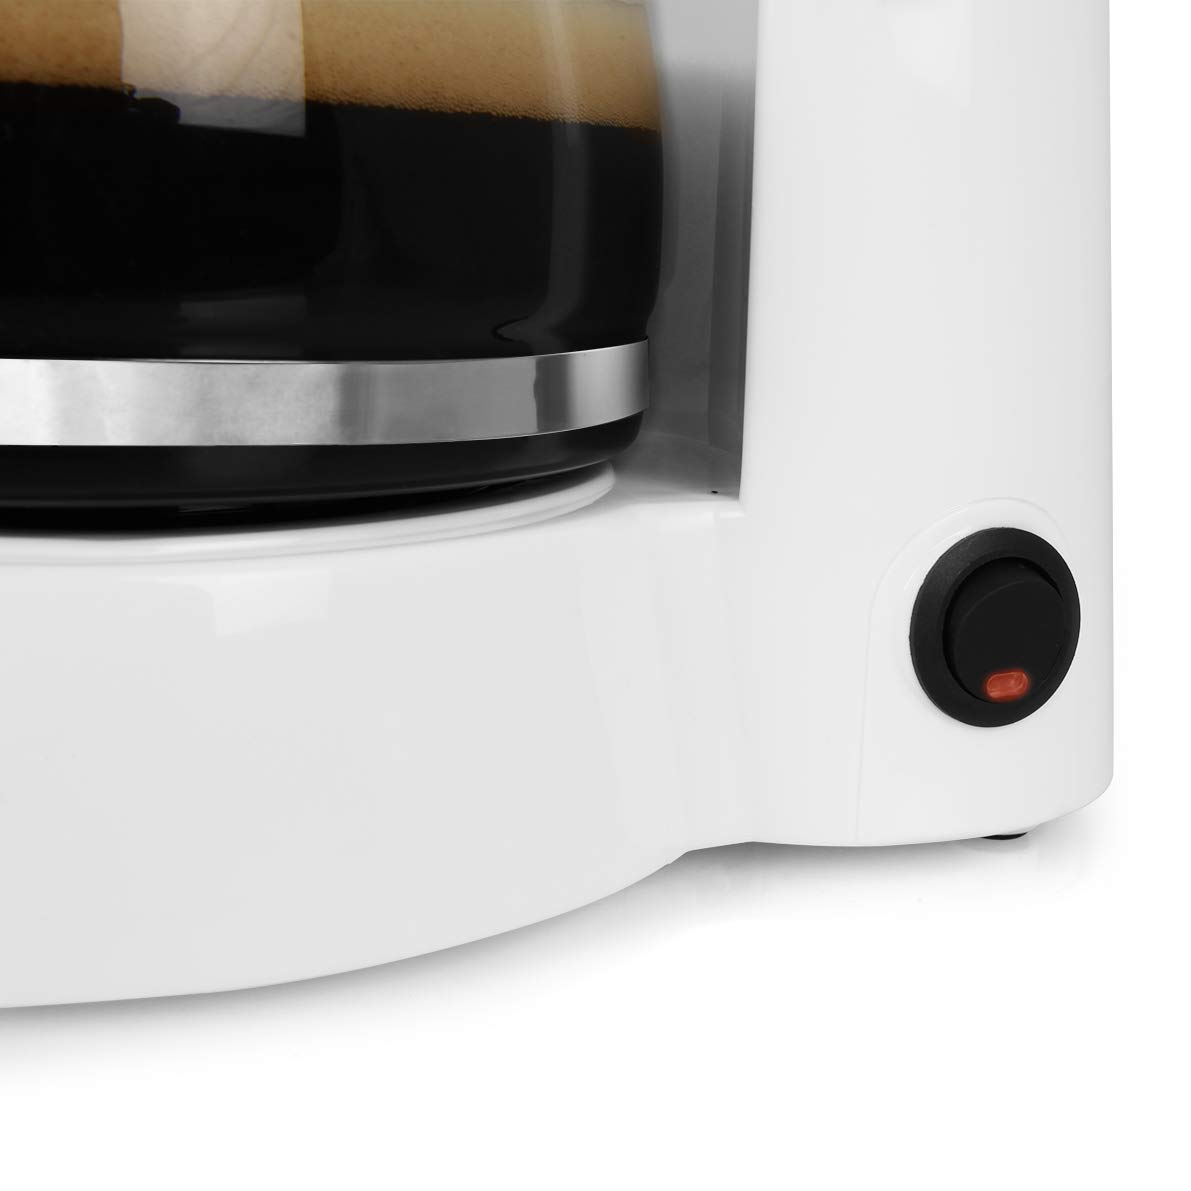 Cafetera de goteo ORBEGOZO CG4012B | ORBEGOZO 4-6 tazas: Amazon.es ...